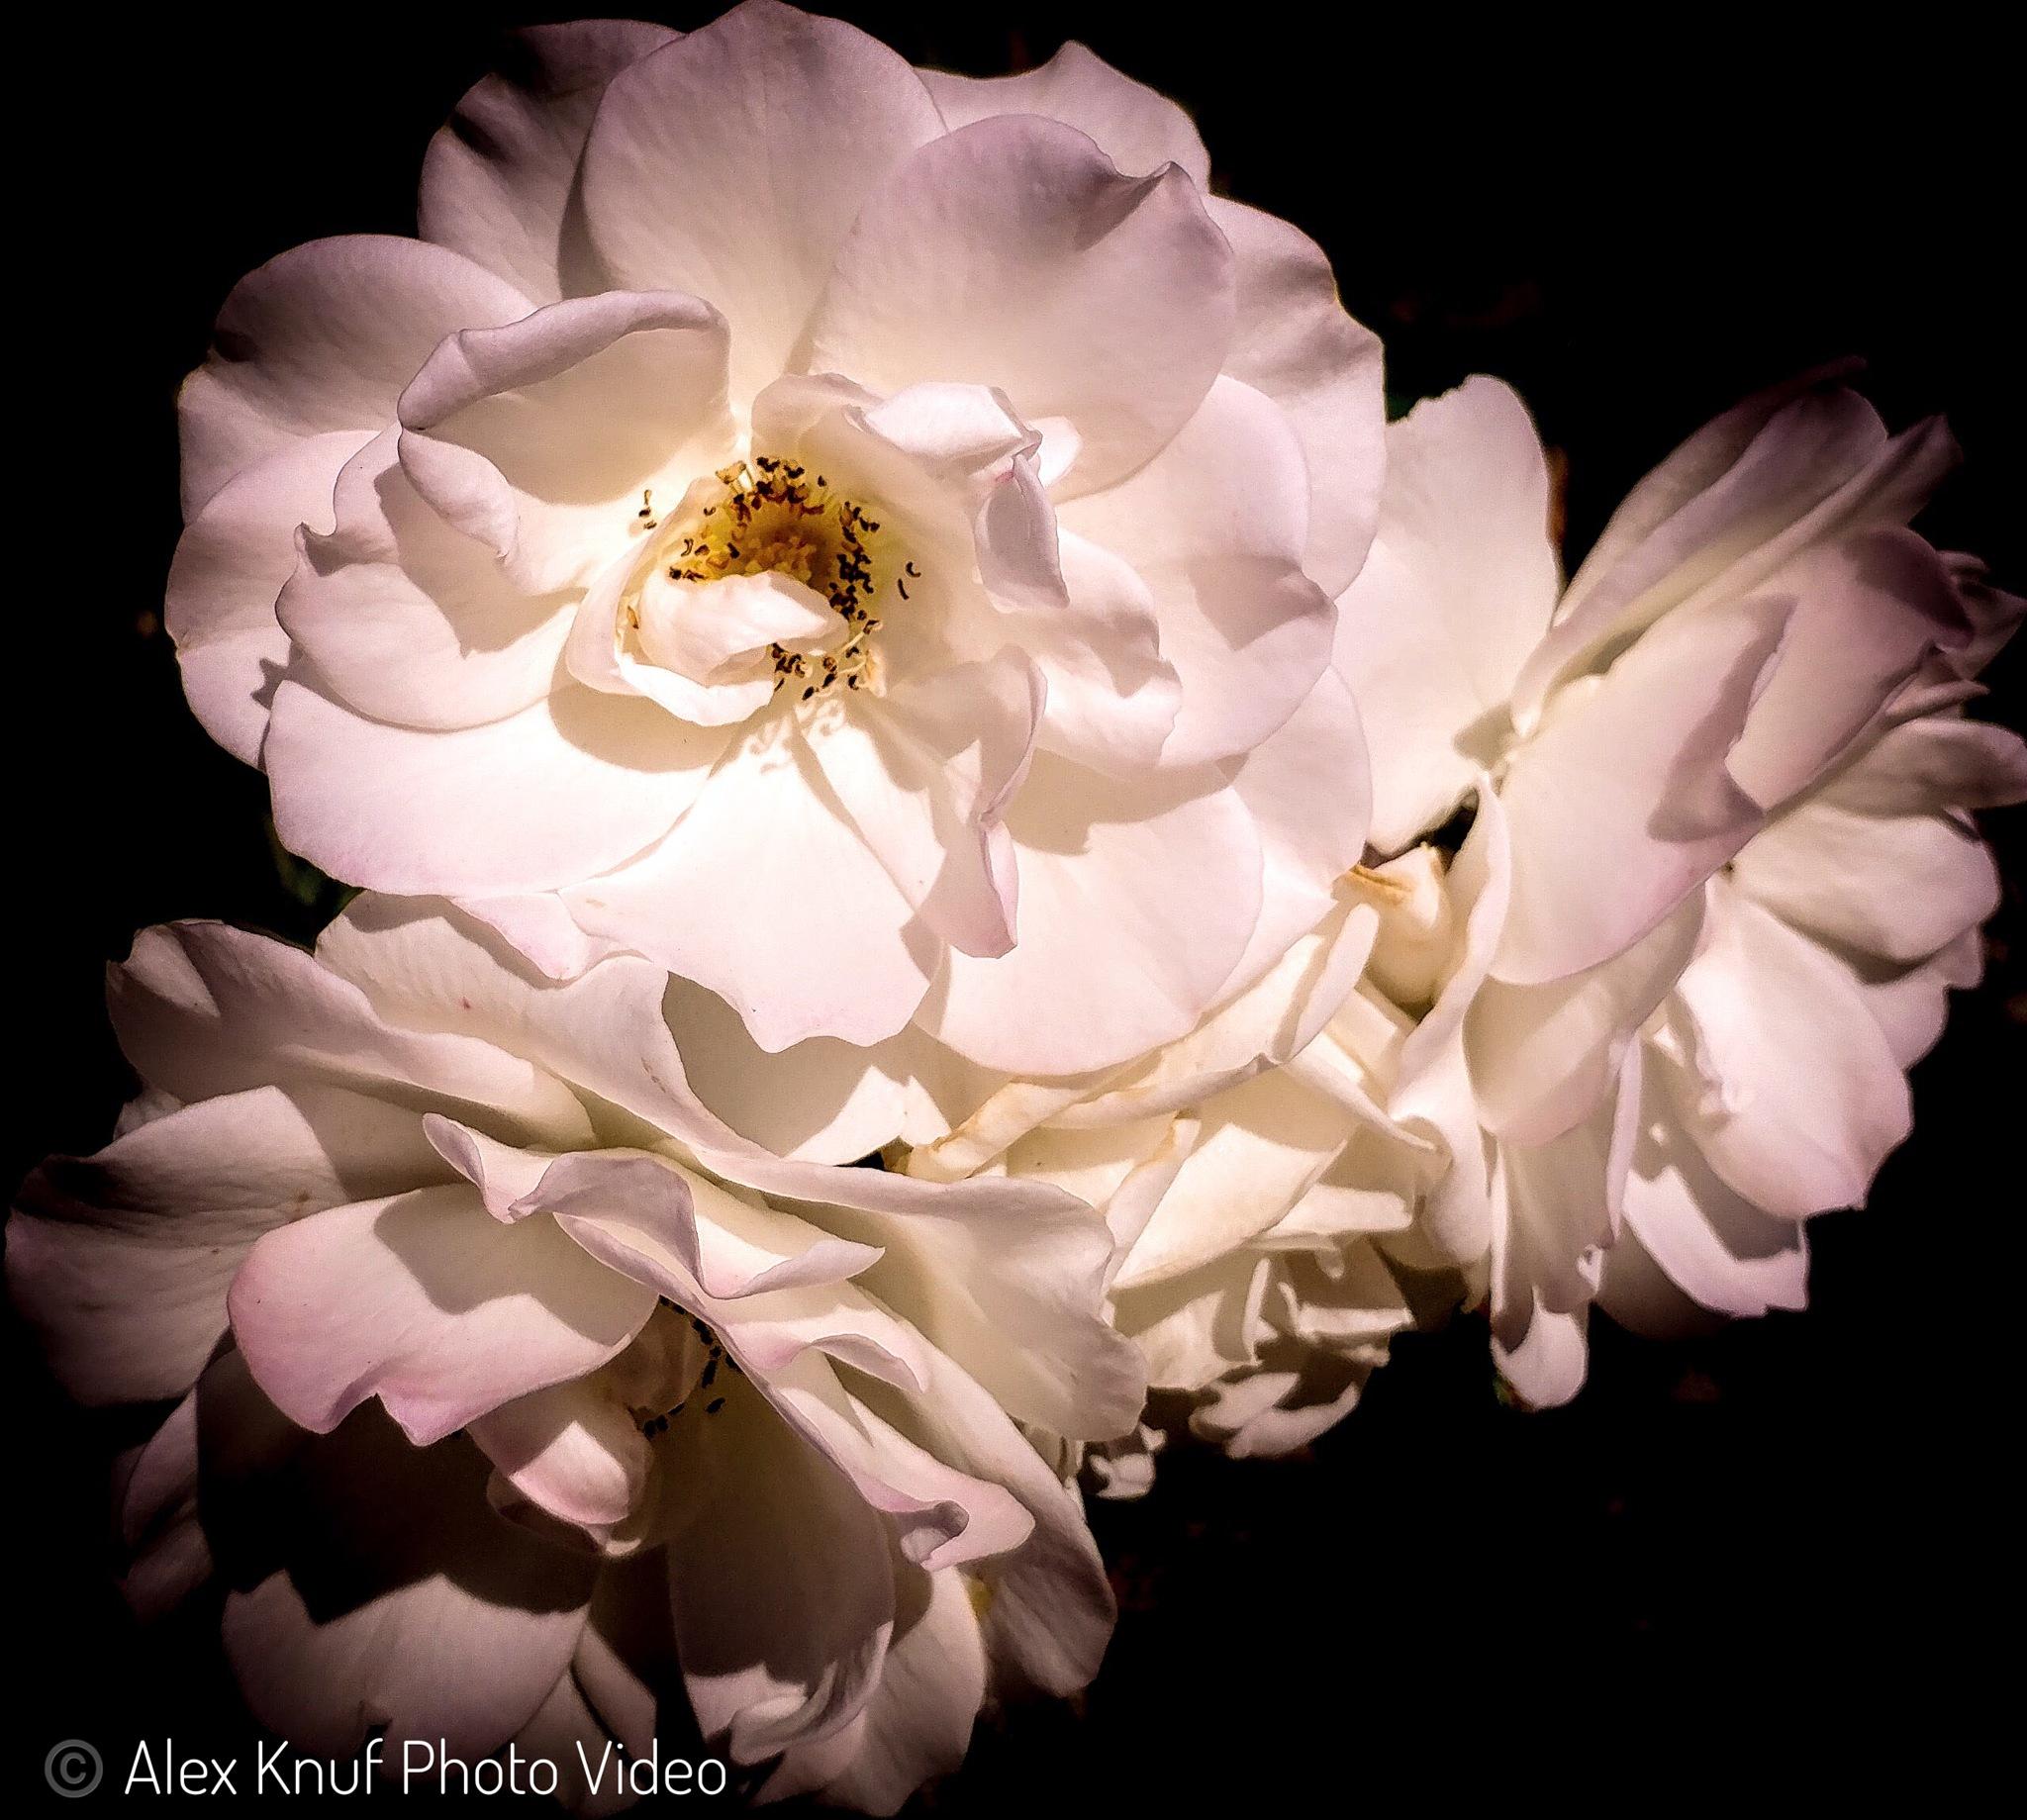 Trio of Flowers by Alex Knuf Photo Video